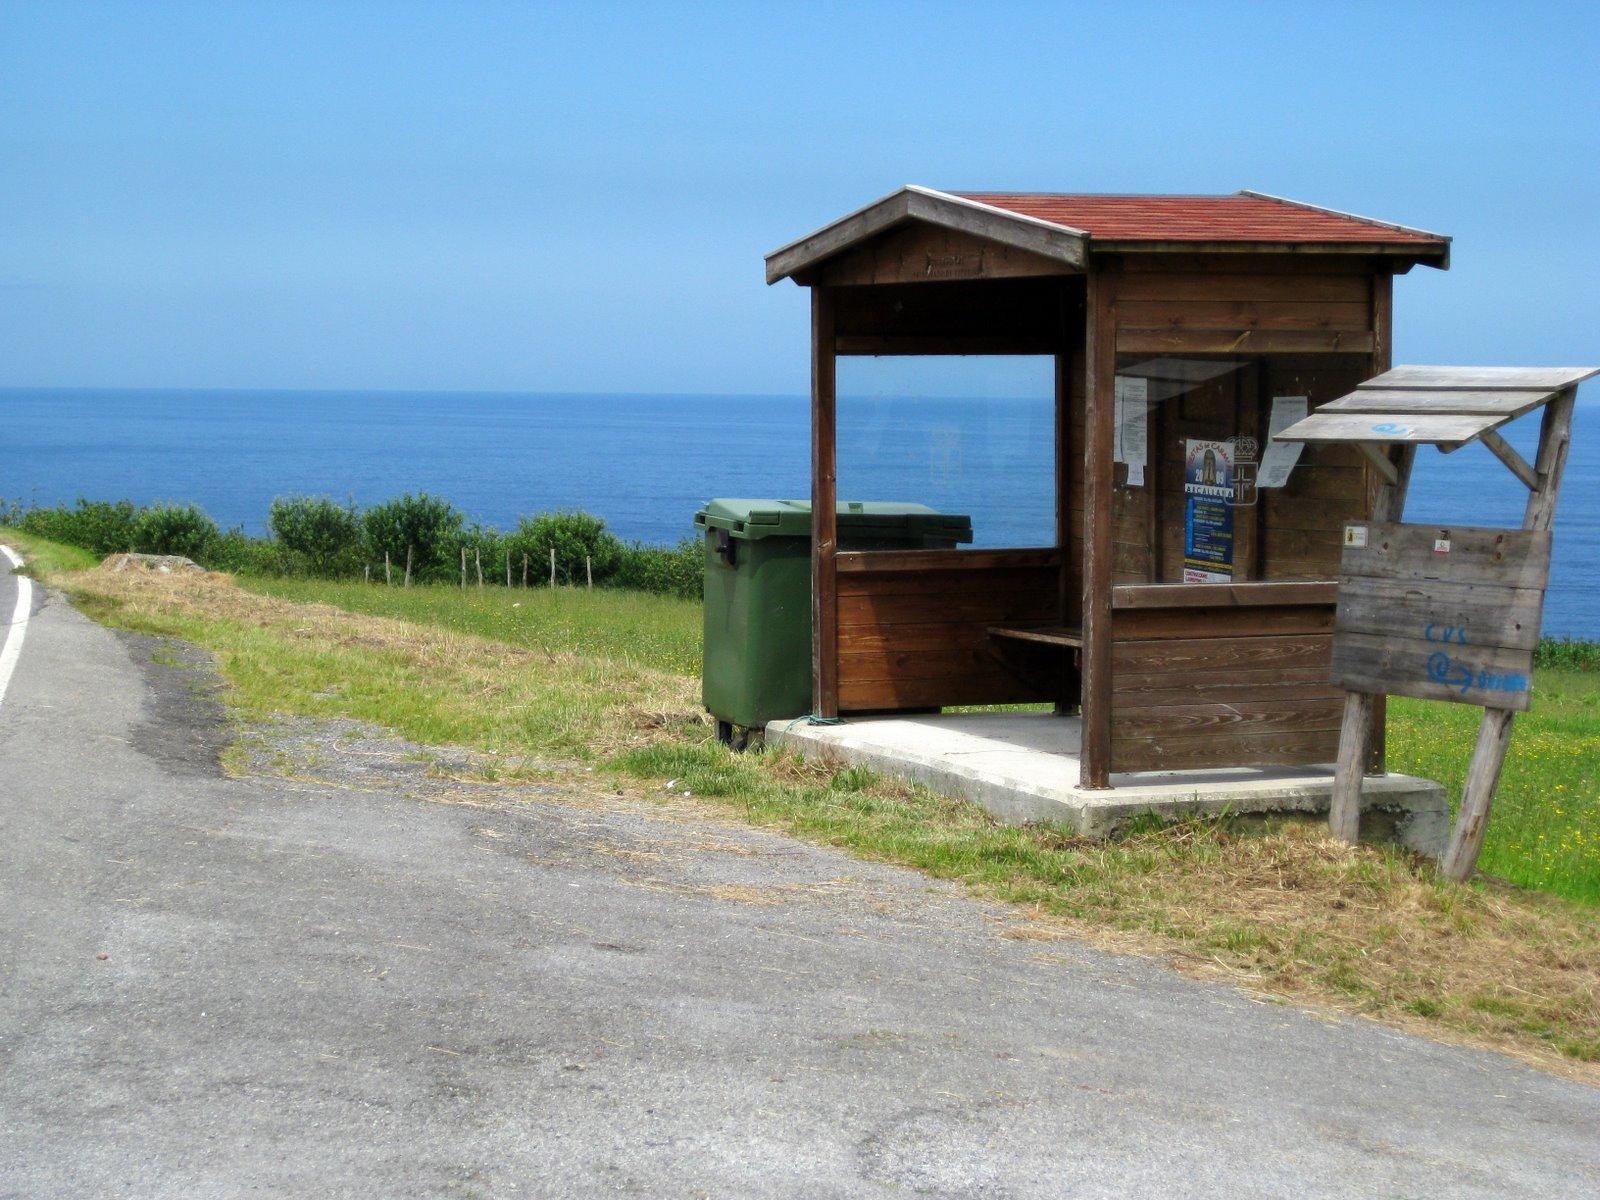 Foto playa Ballota. Bilddokumentation der Pilgerreise von San Sebastian nach Finesterre